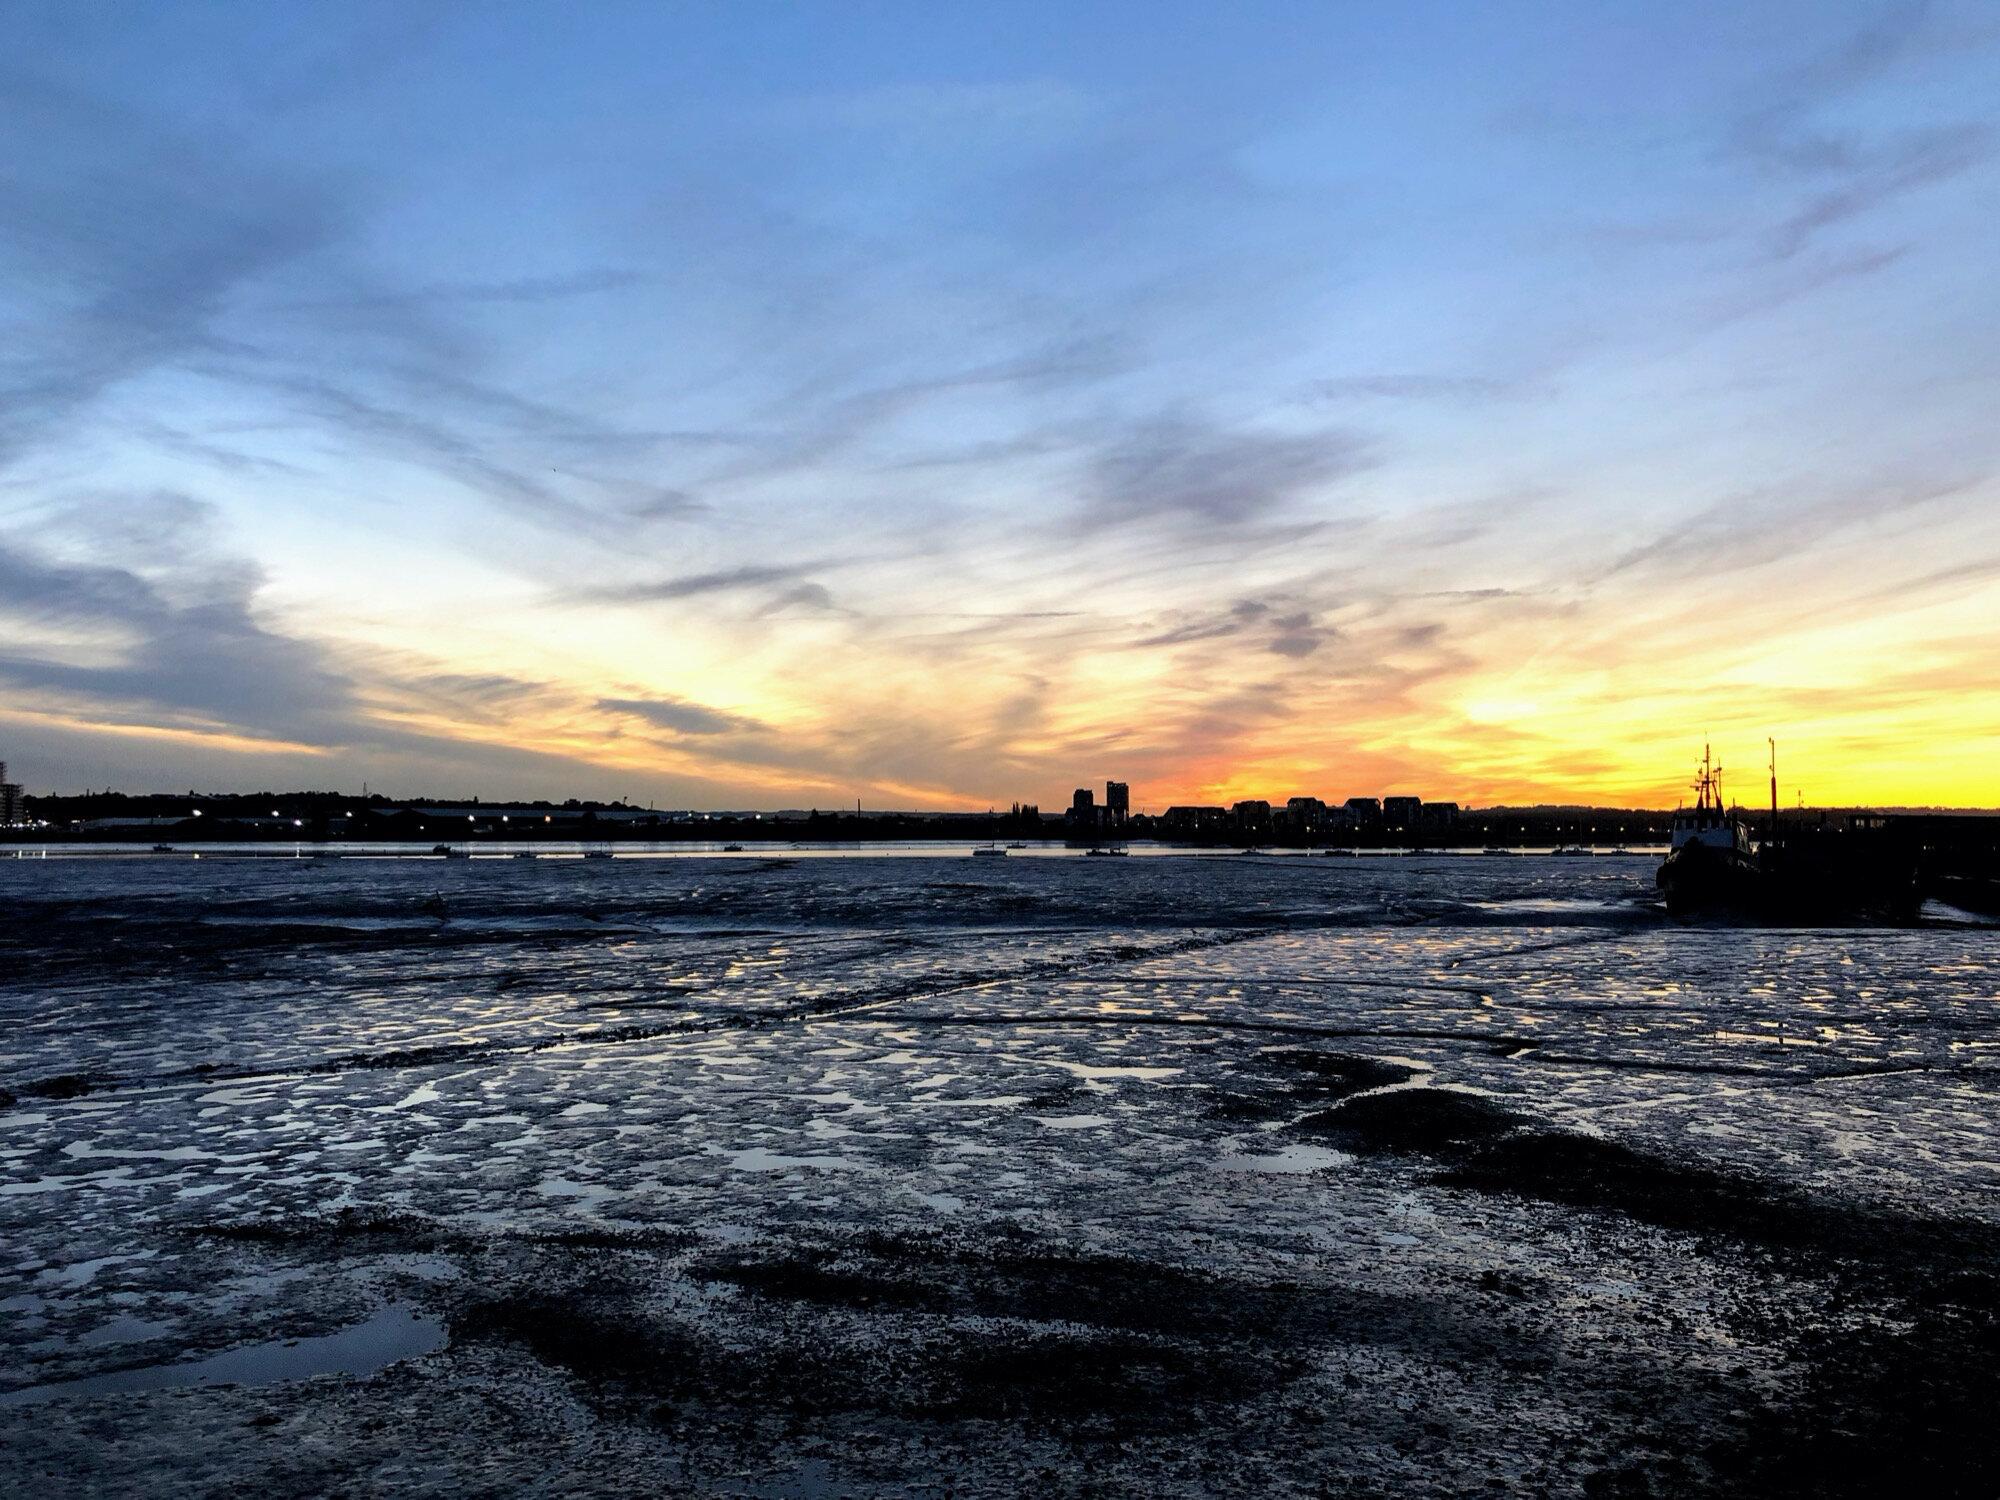 Port Werburgh Sunset by Ross Farley.jpg